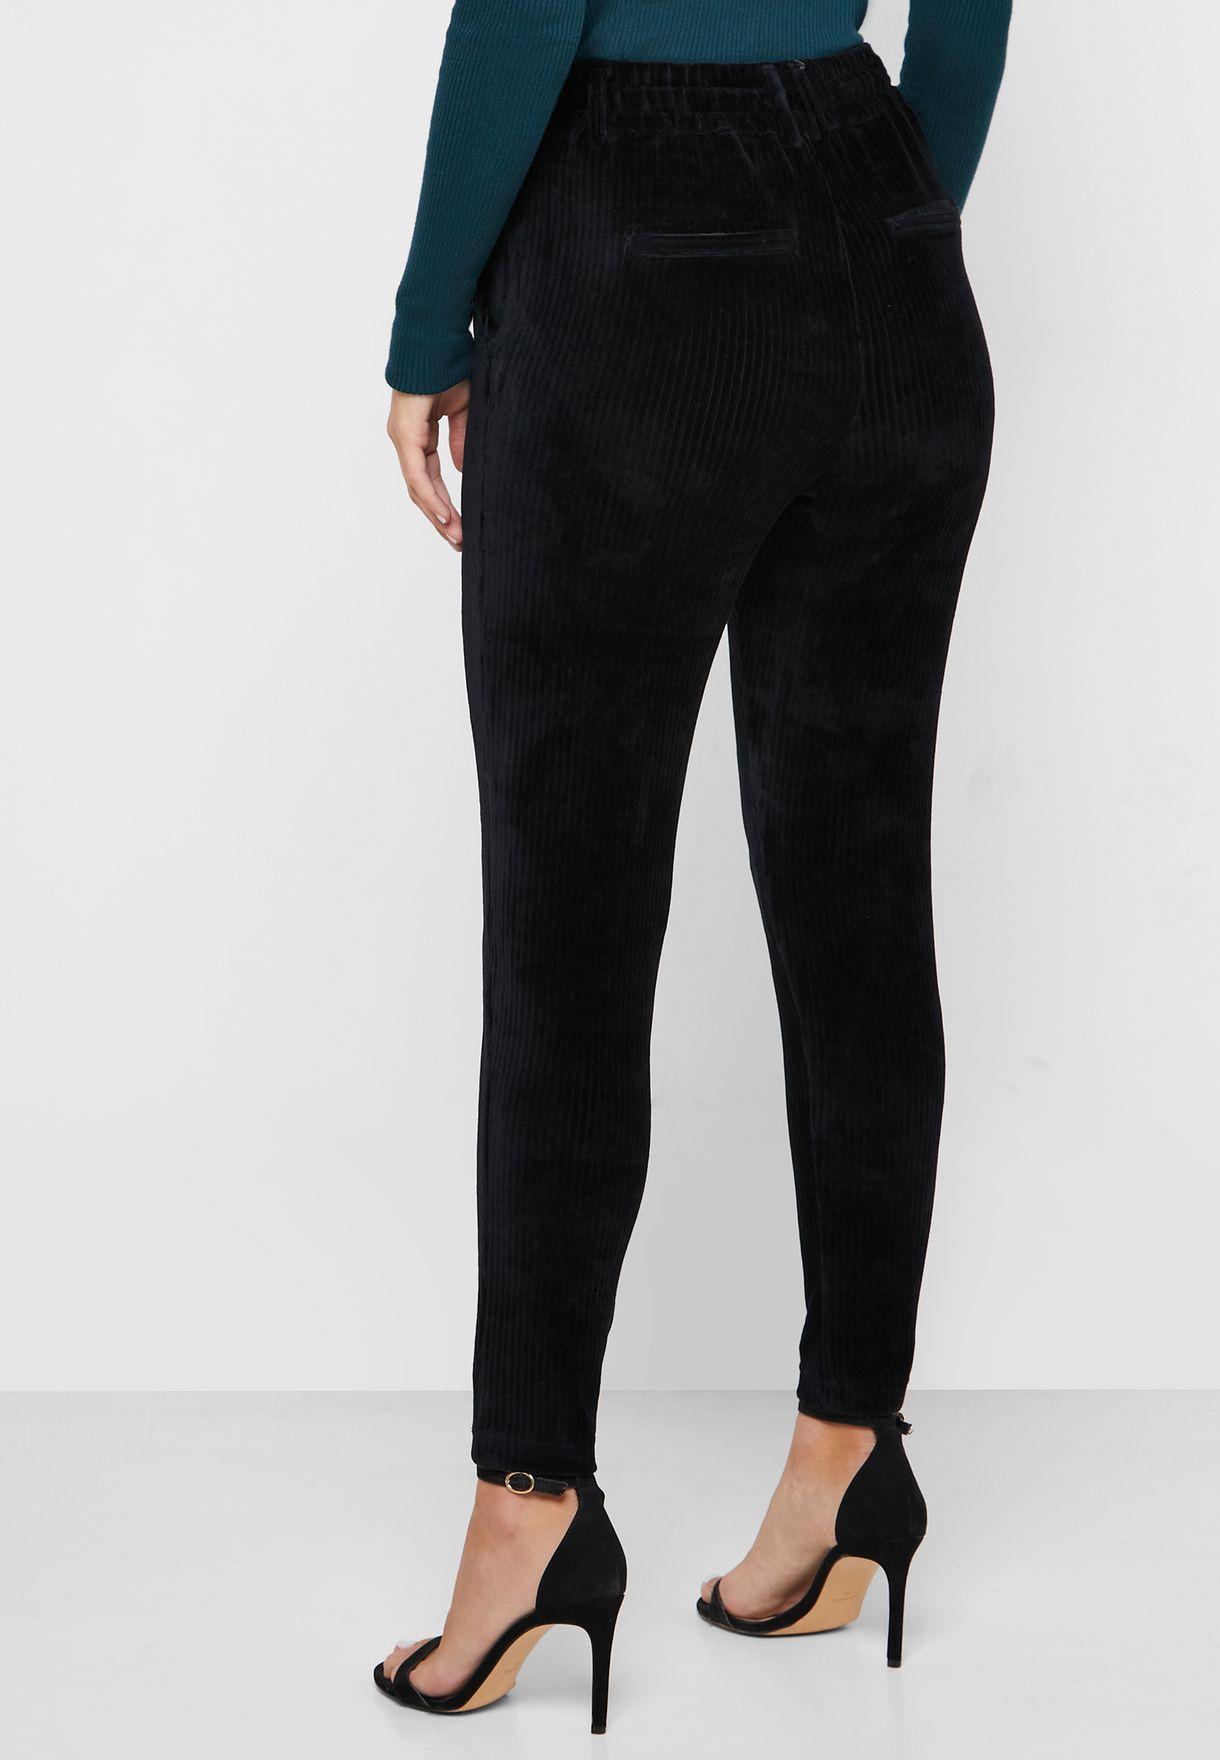 Regular Length Tie Waist Pants